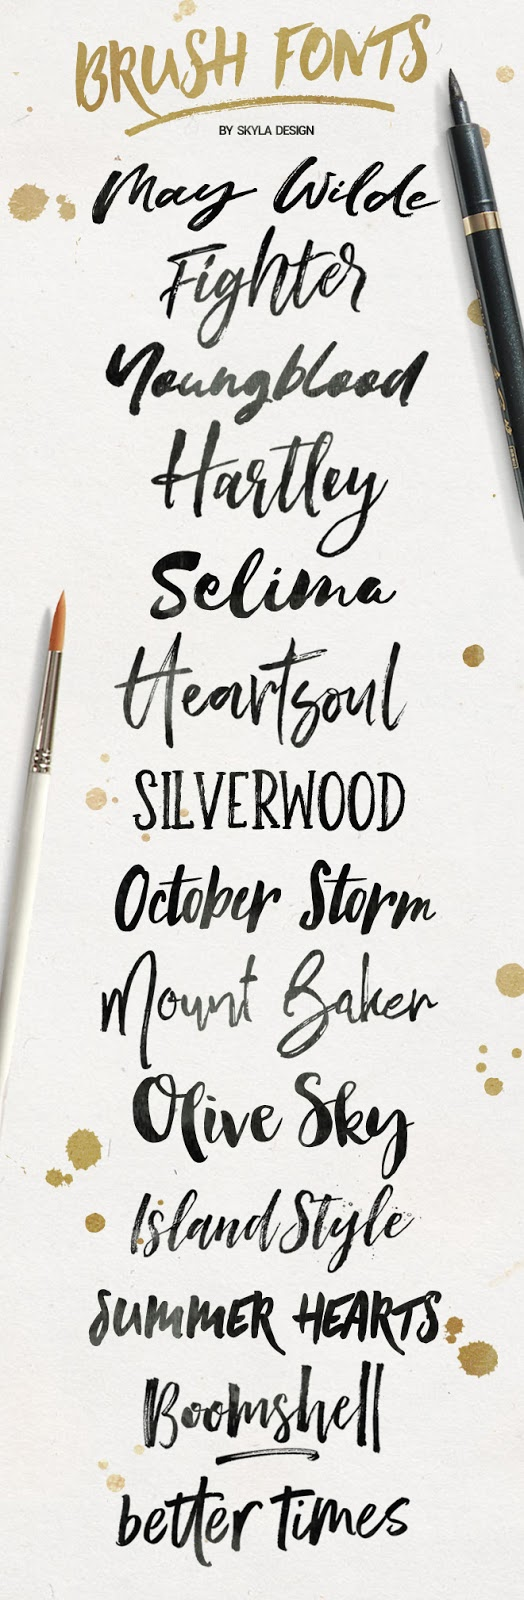 free brush fonts